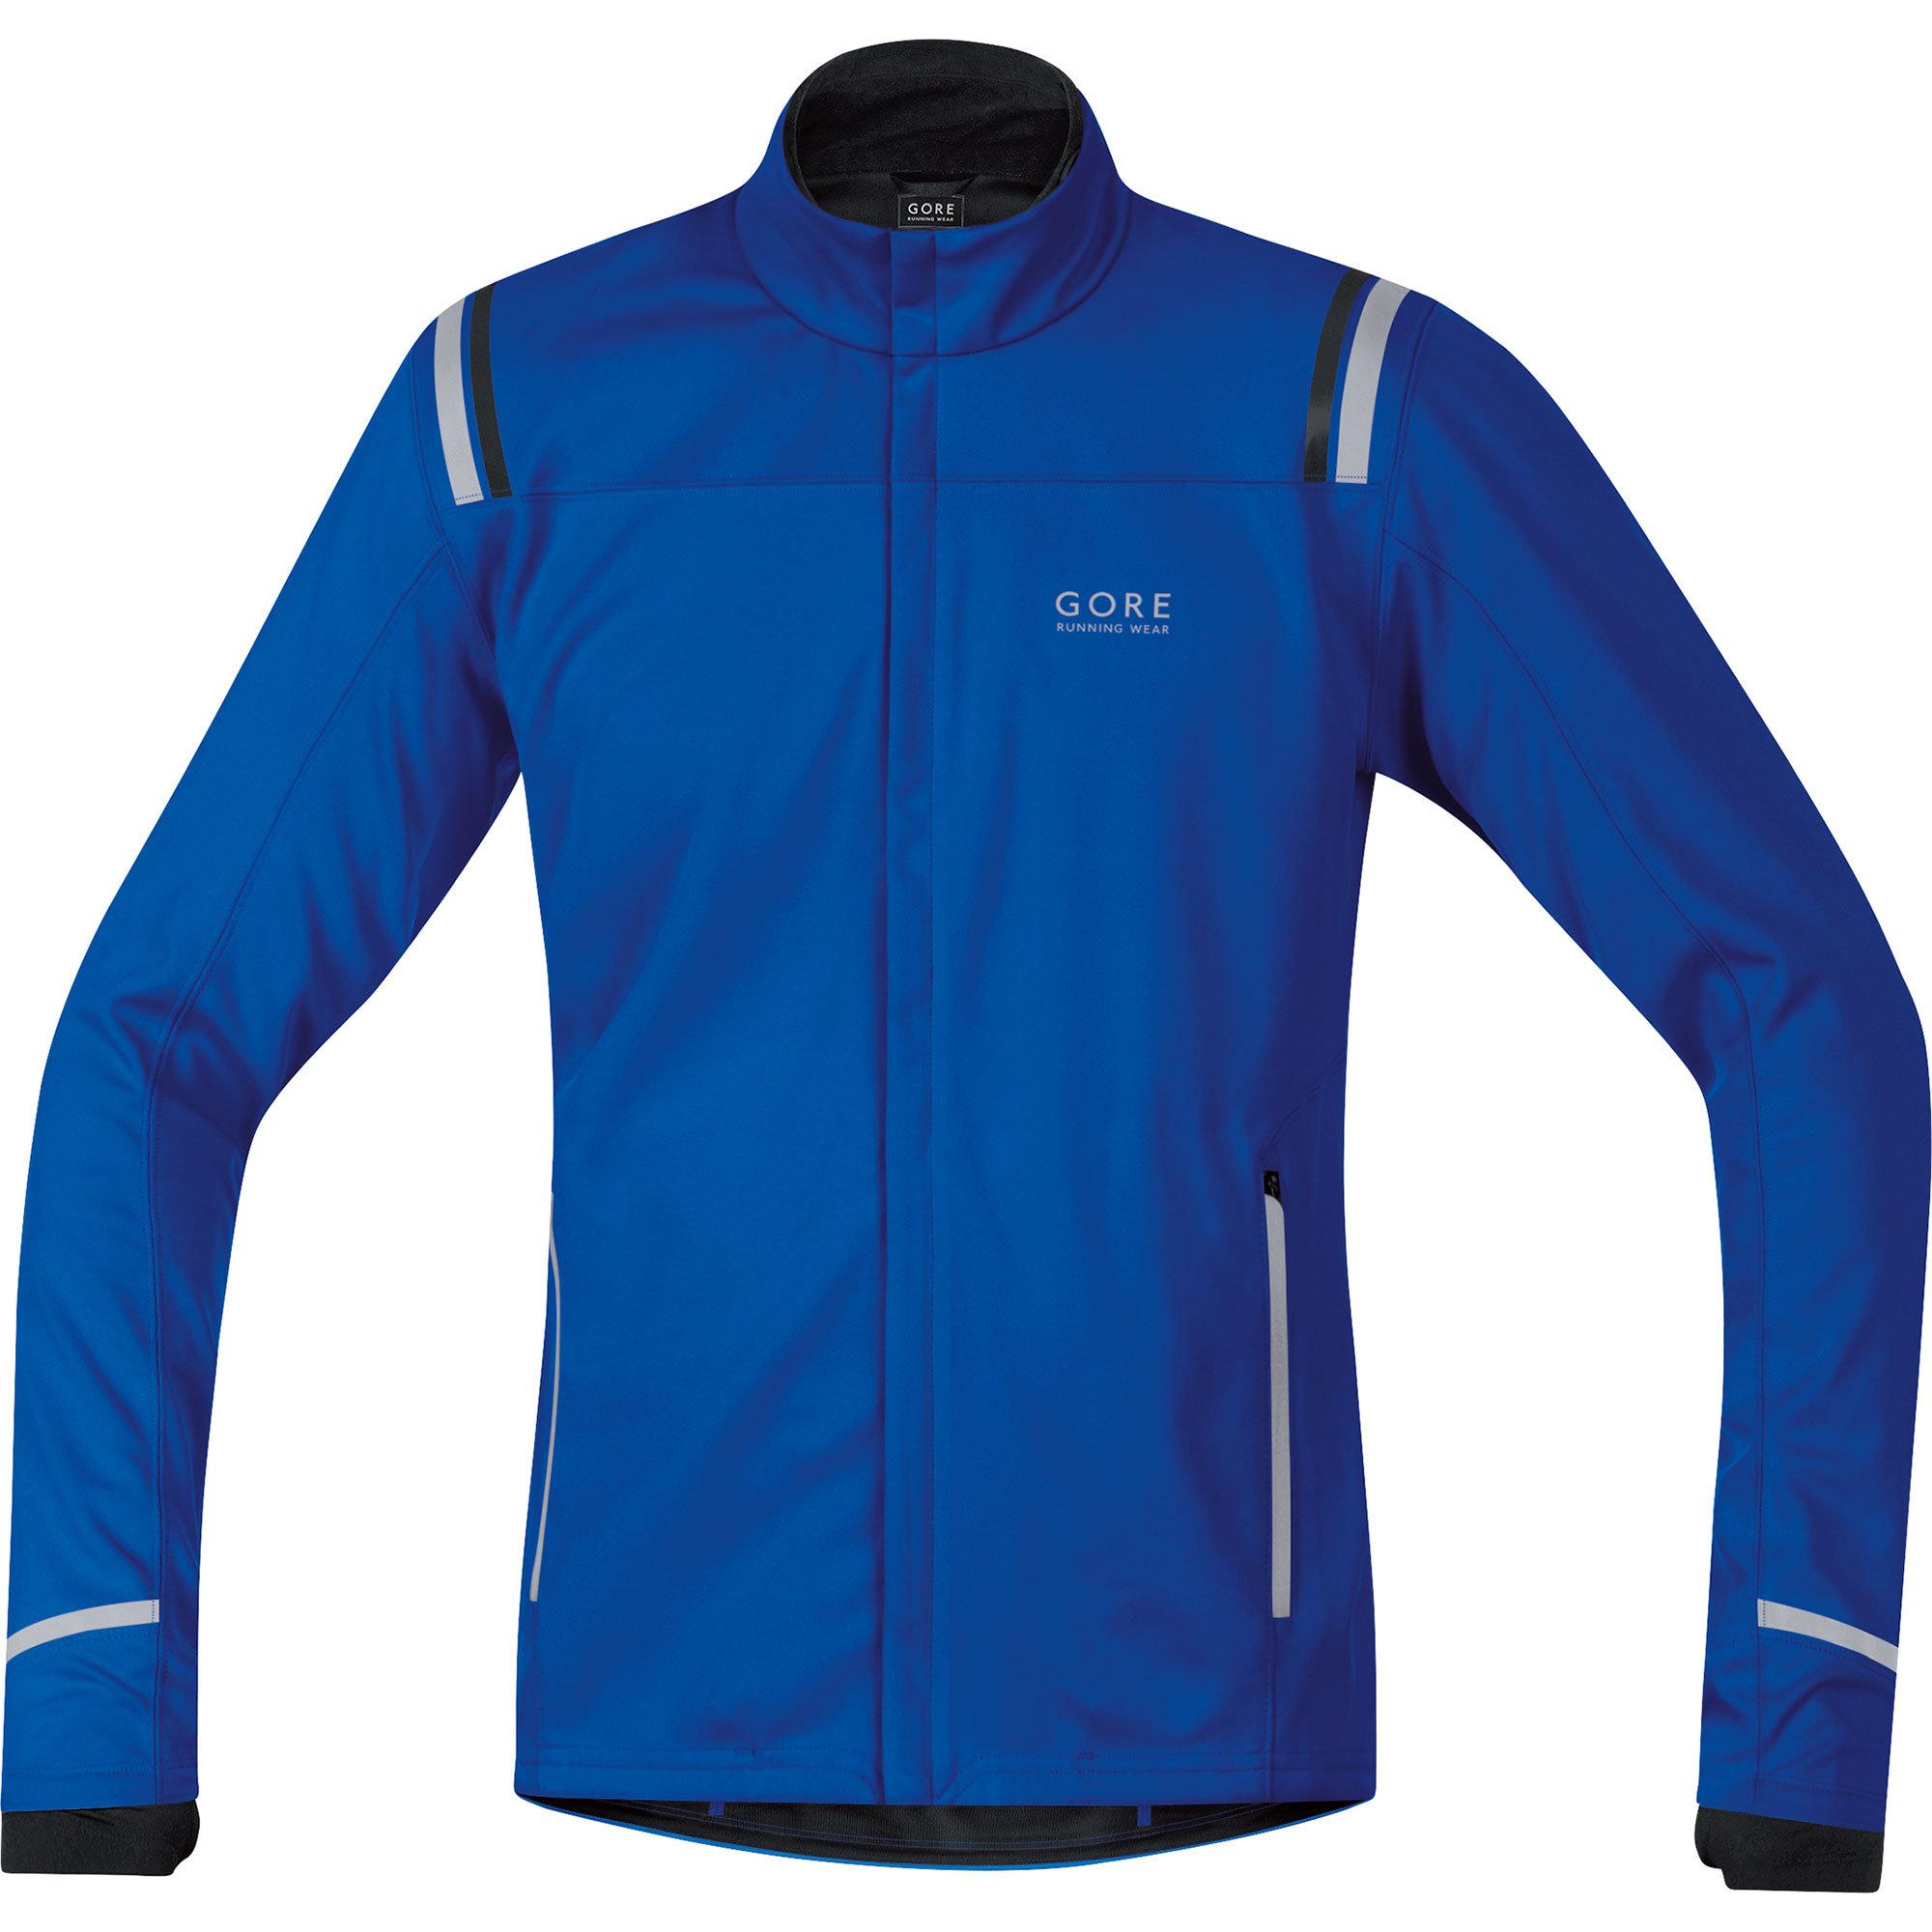 Gore Mythos 2.0 WS SO Jacket in Blau